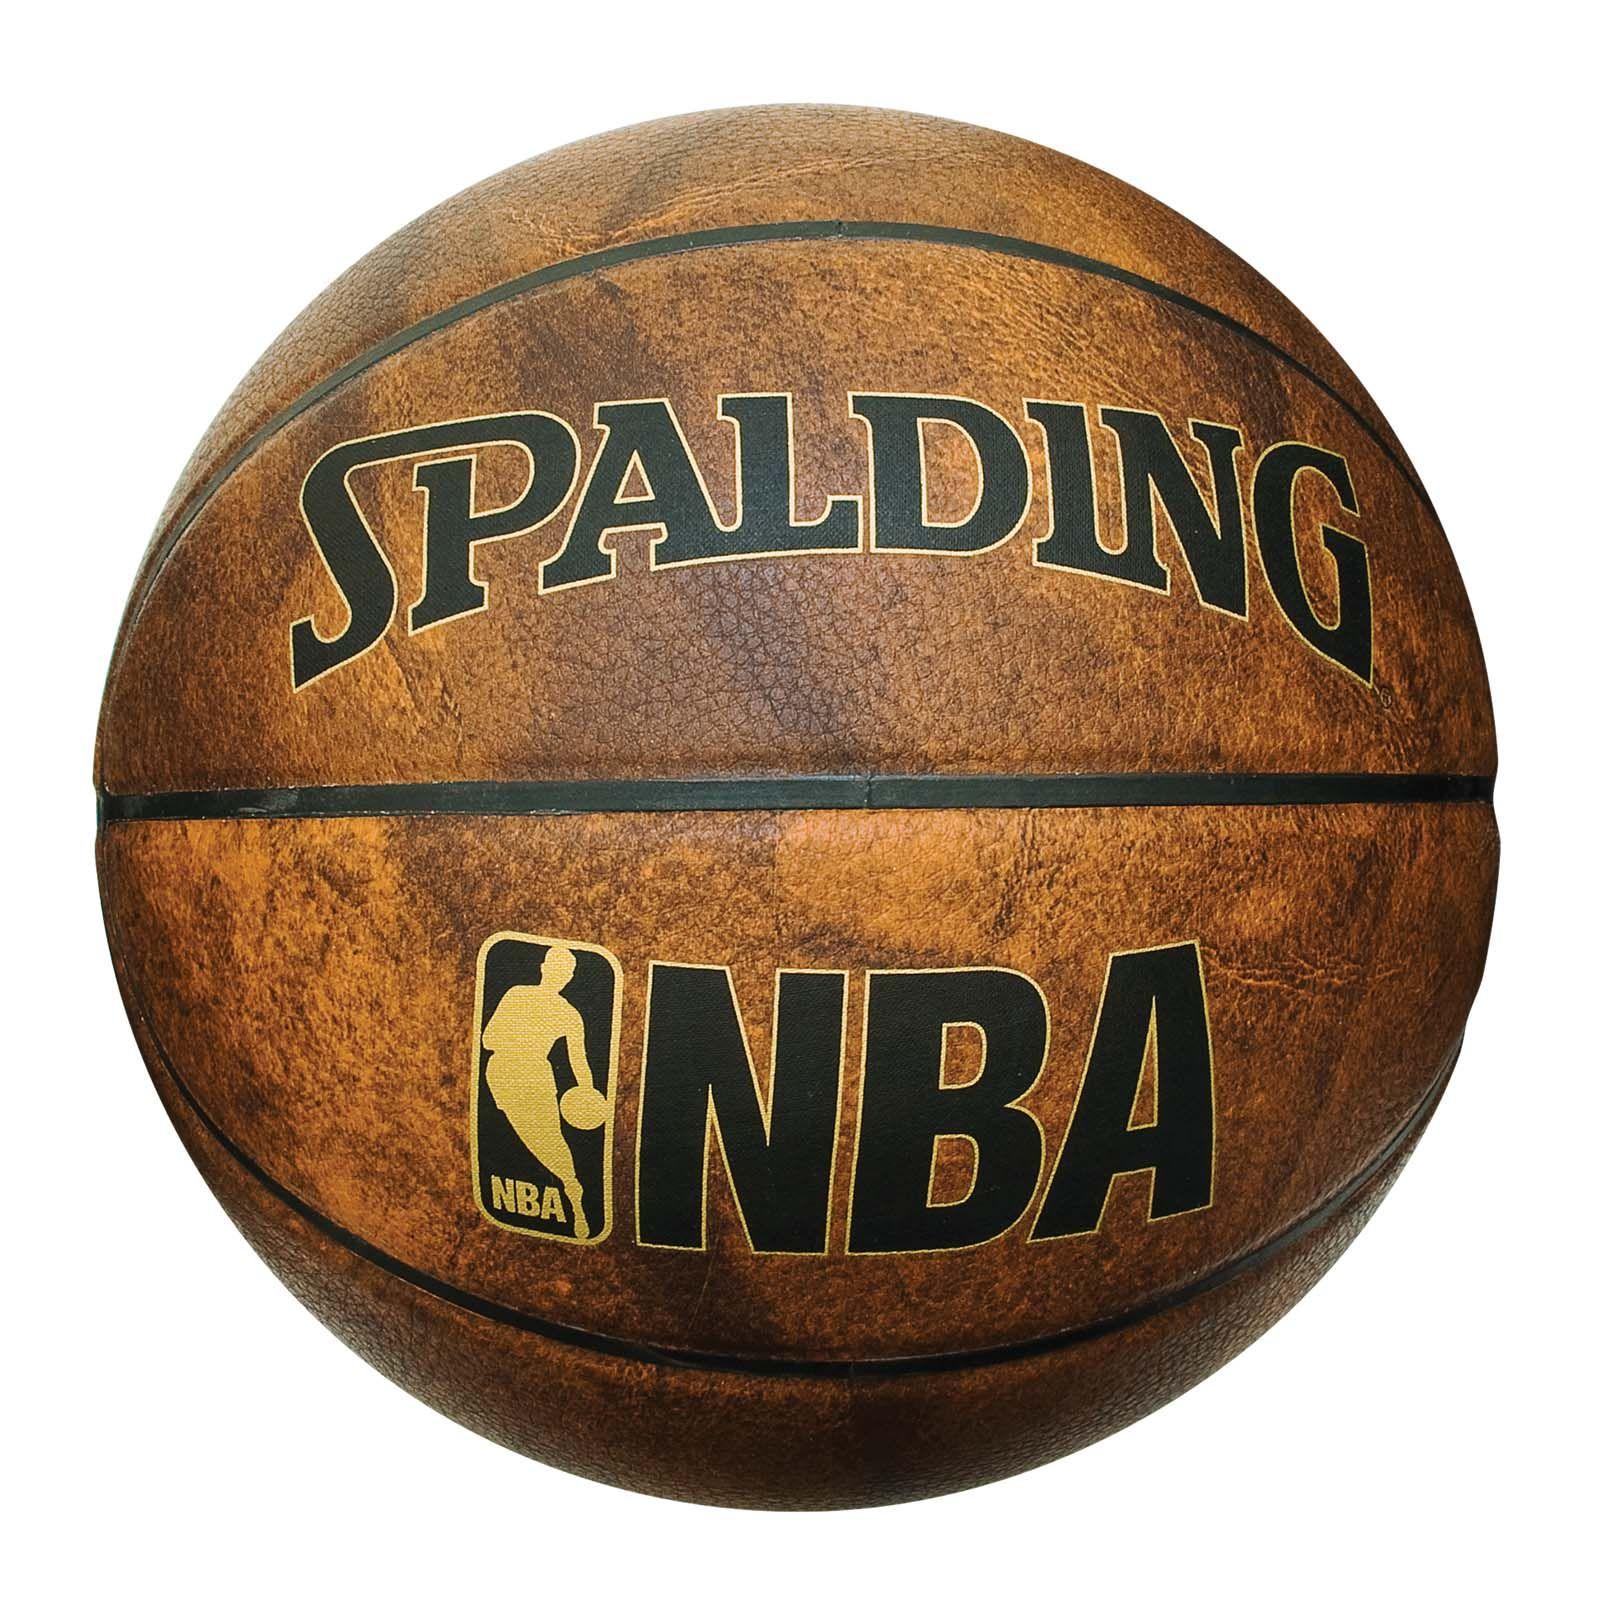 spalding nba heritage indoor outdoor basketball. Black Bedroom Furniture Sets. Home Design Ideas